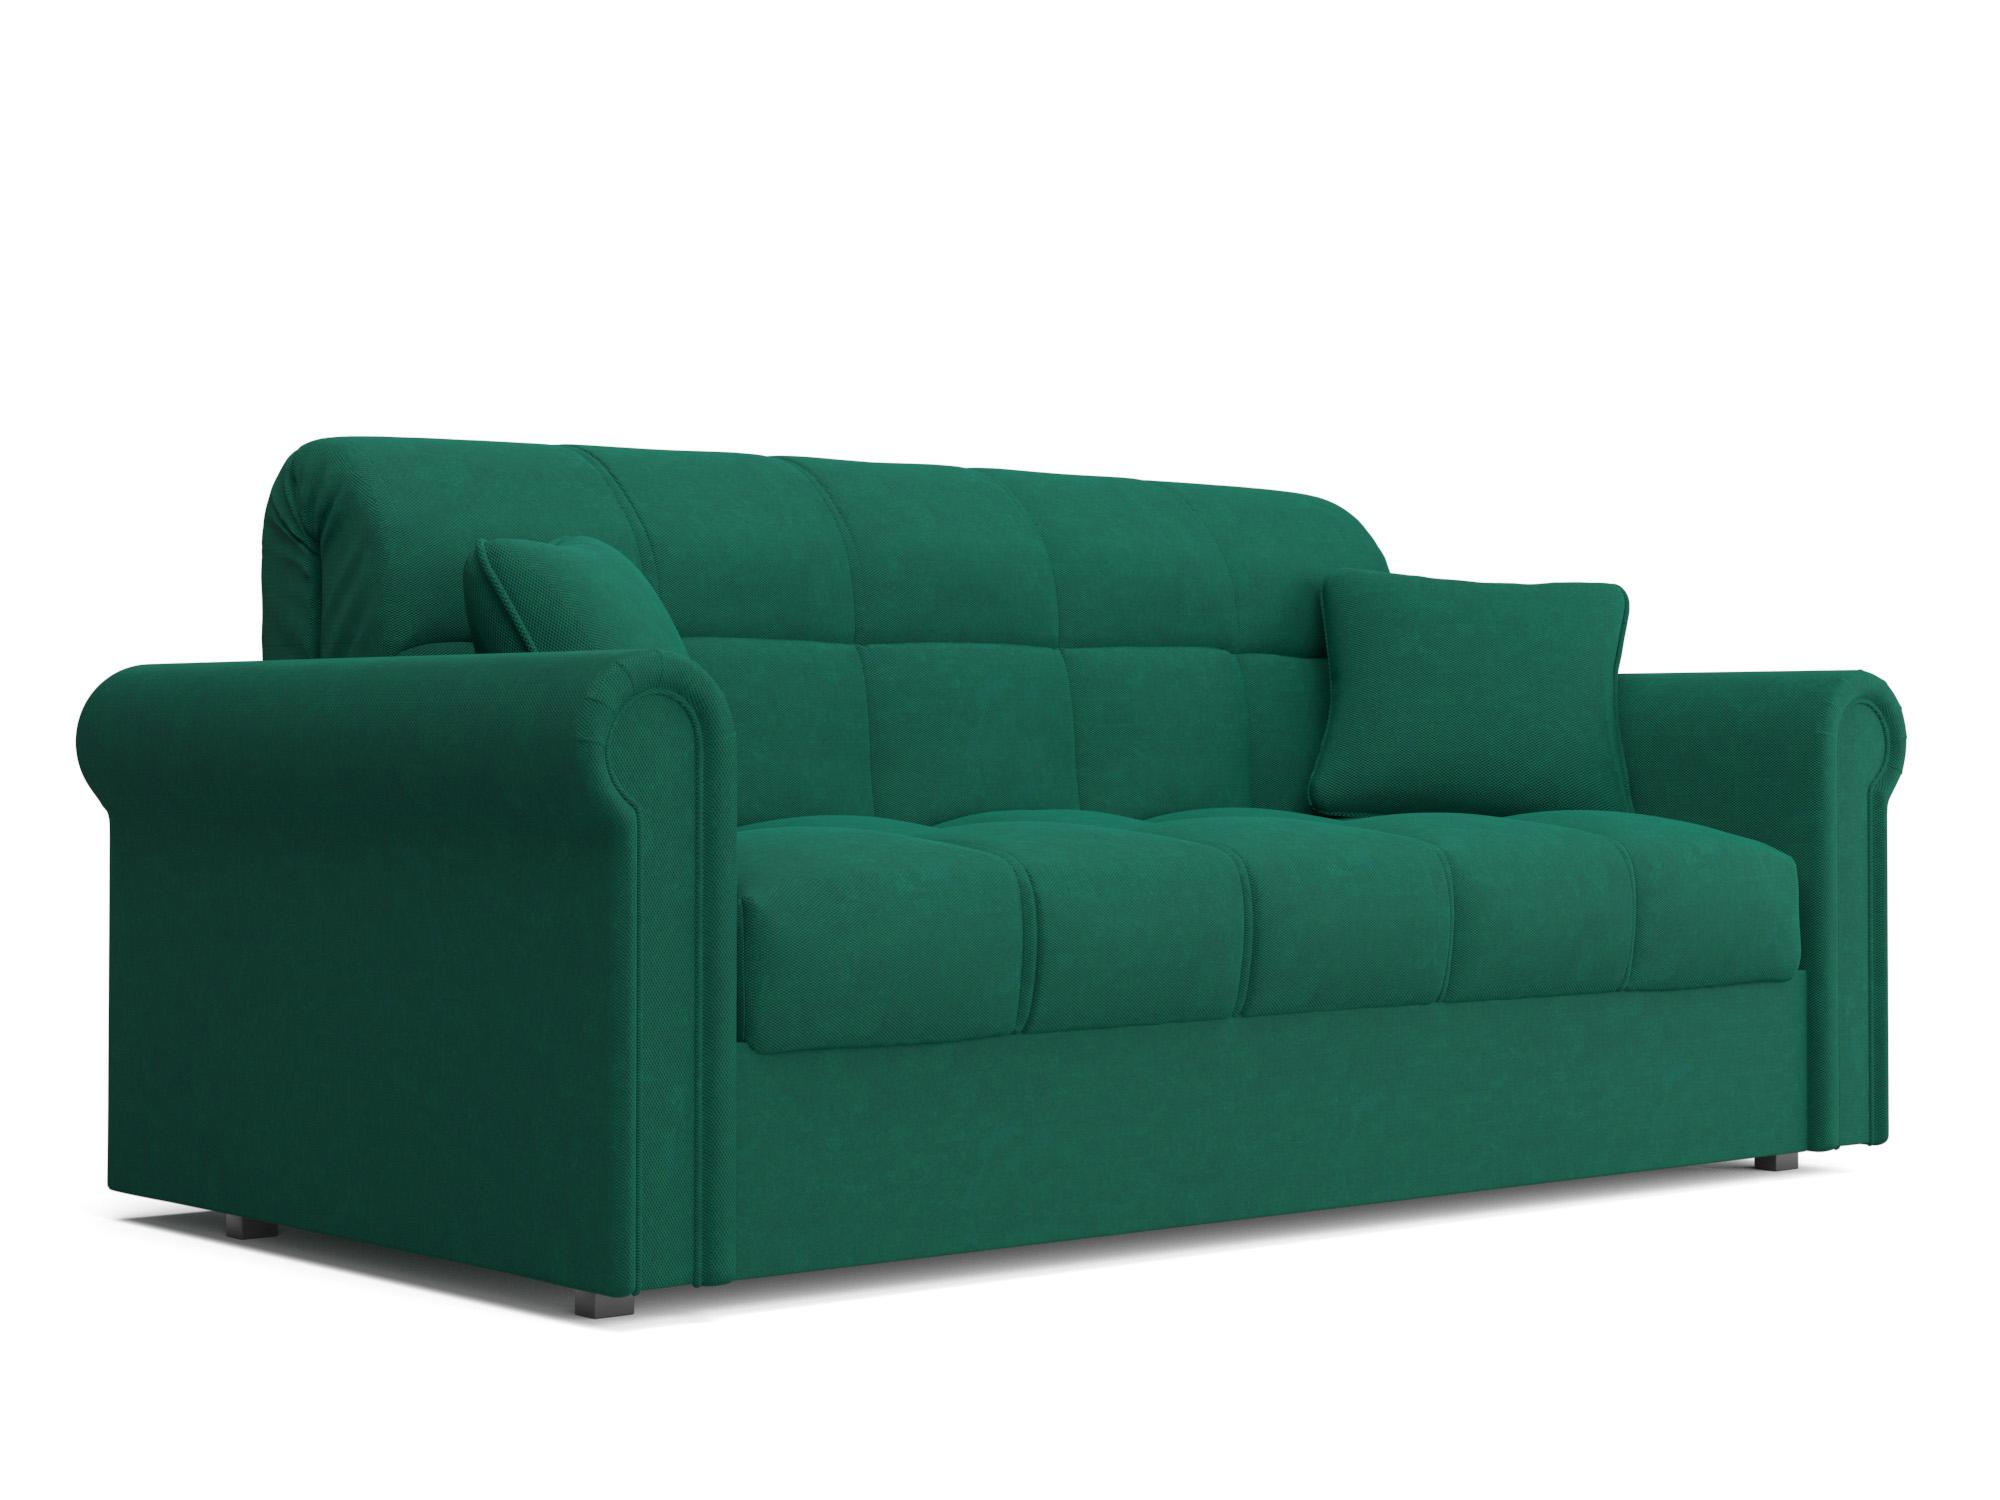 Диван Палермо Maxx 1,6 MebelVia Зеленый